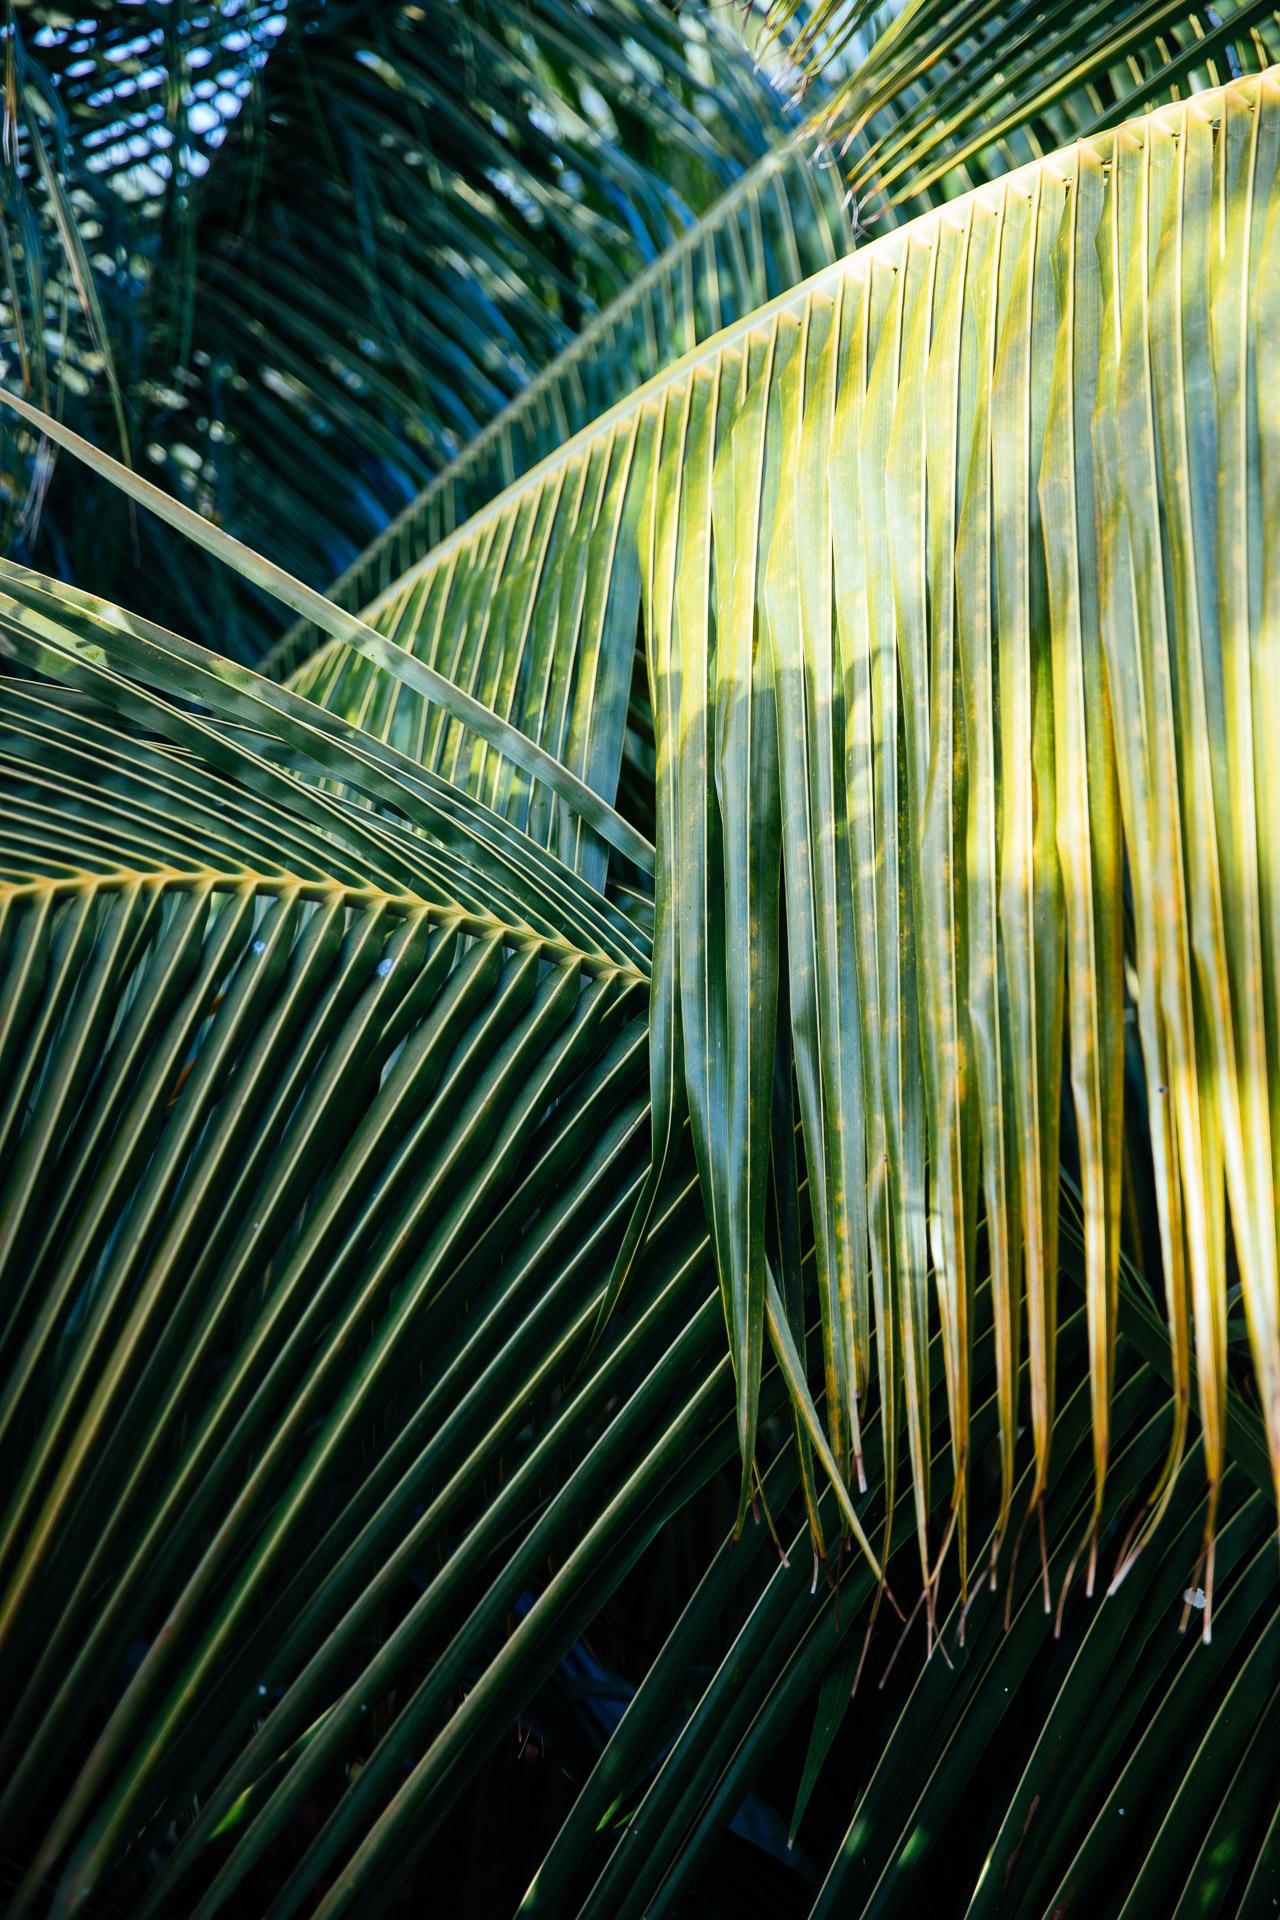 caribbean-hotel-resort-photographer-olas-tulum-mexico-3639.jpg